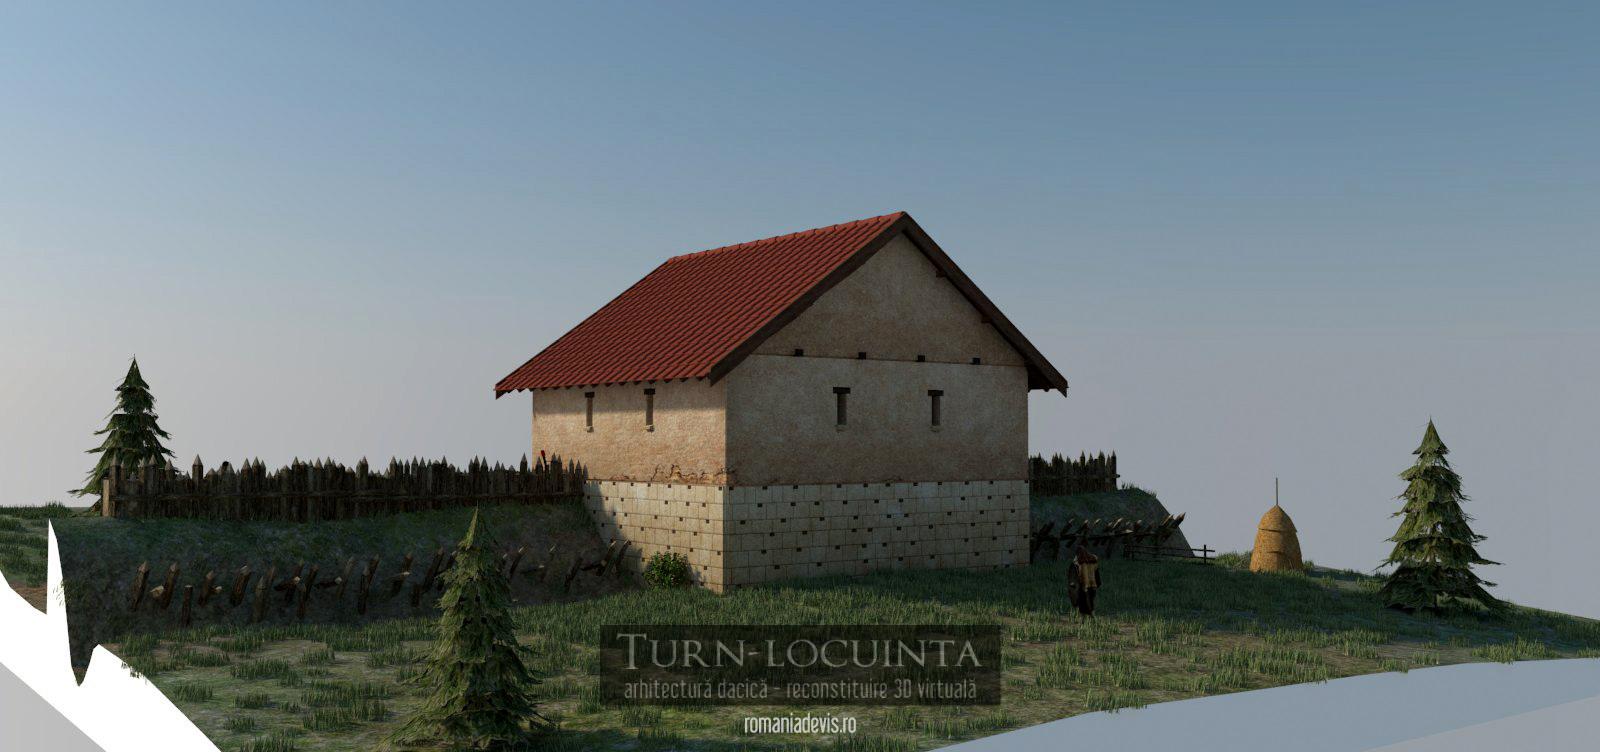 Turn-locuinta, reconstituire 3D virtuala (ipotetica) v2